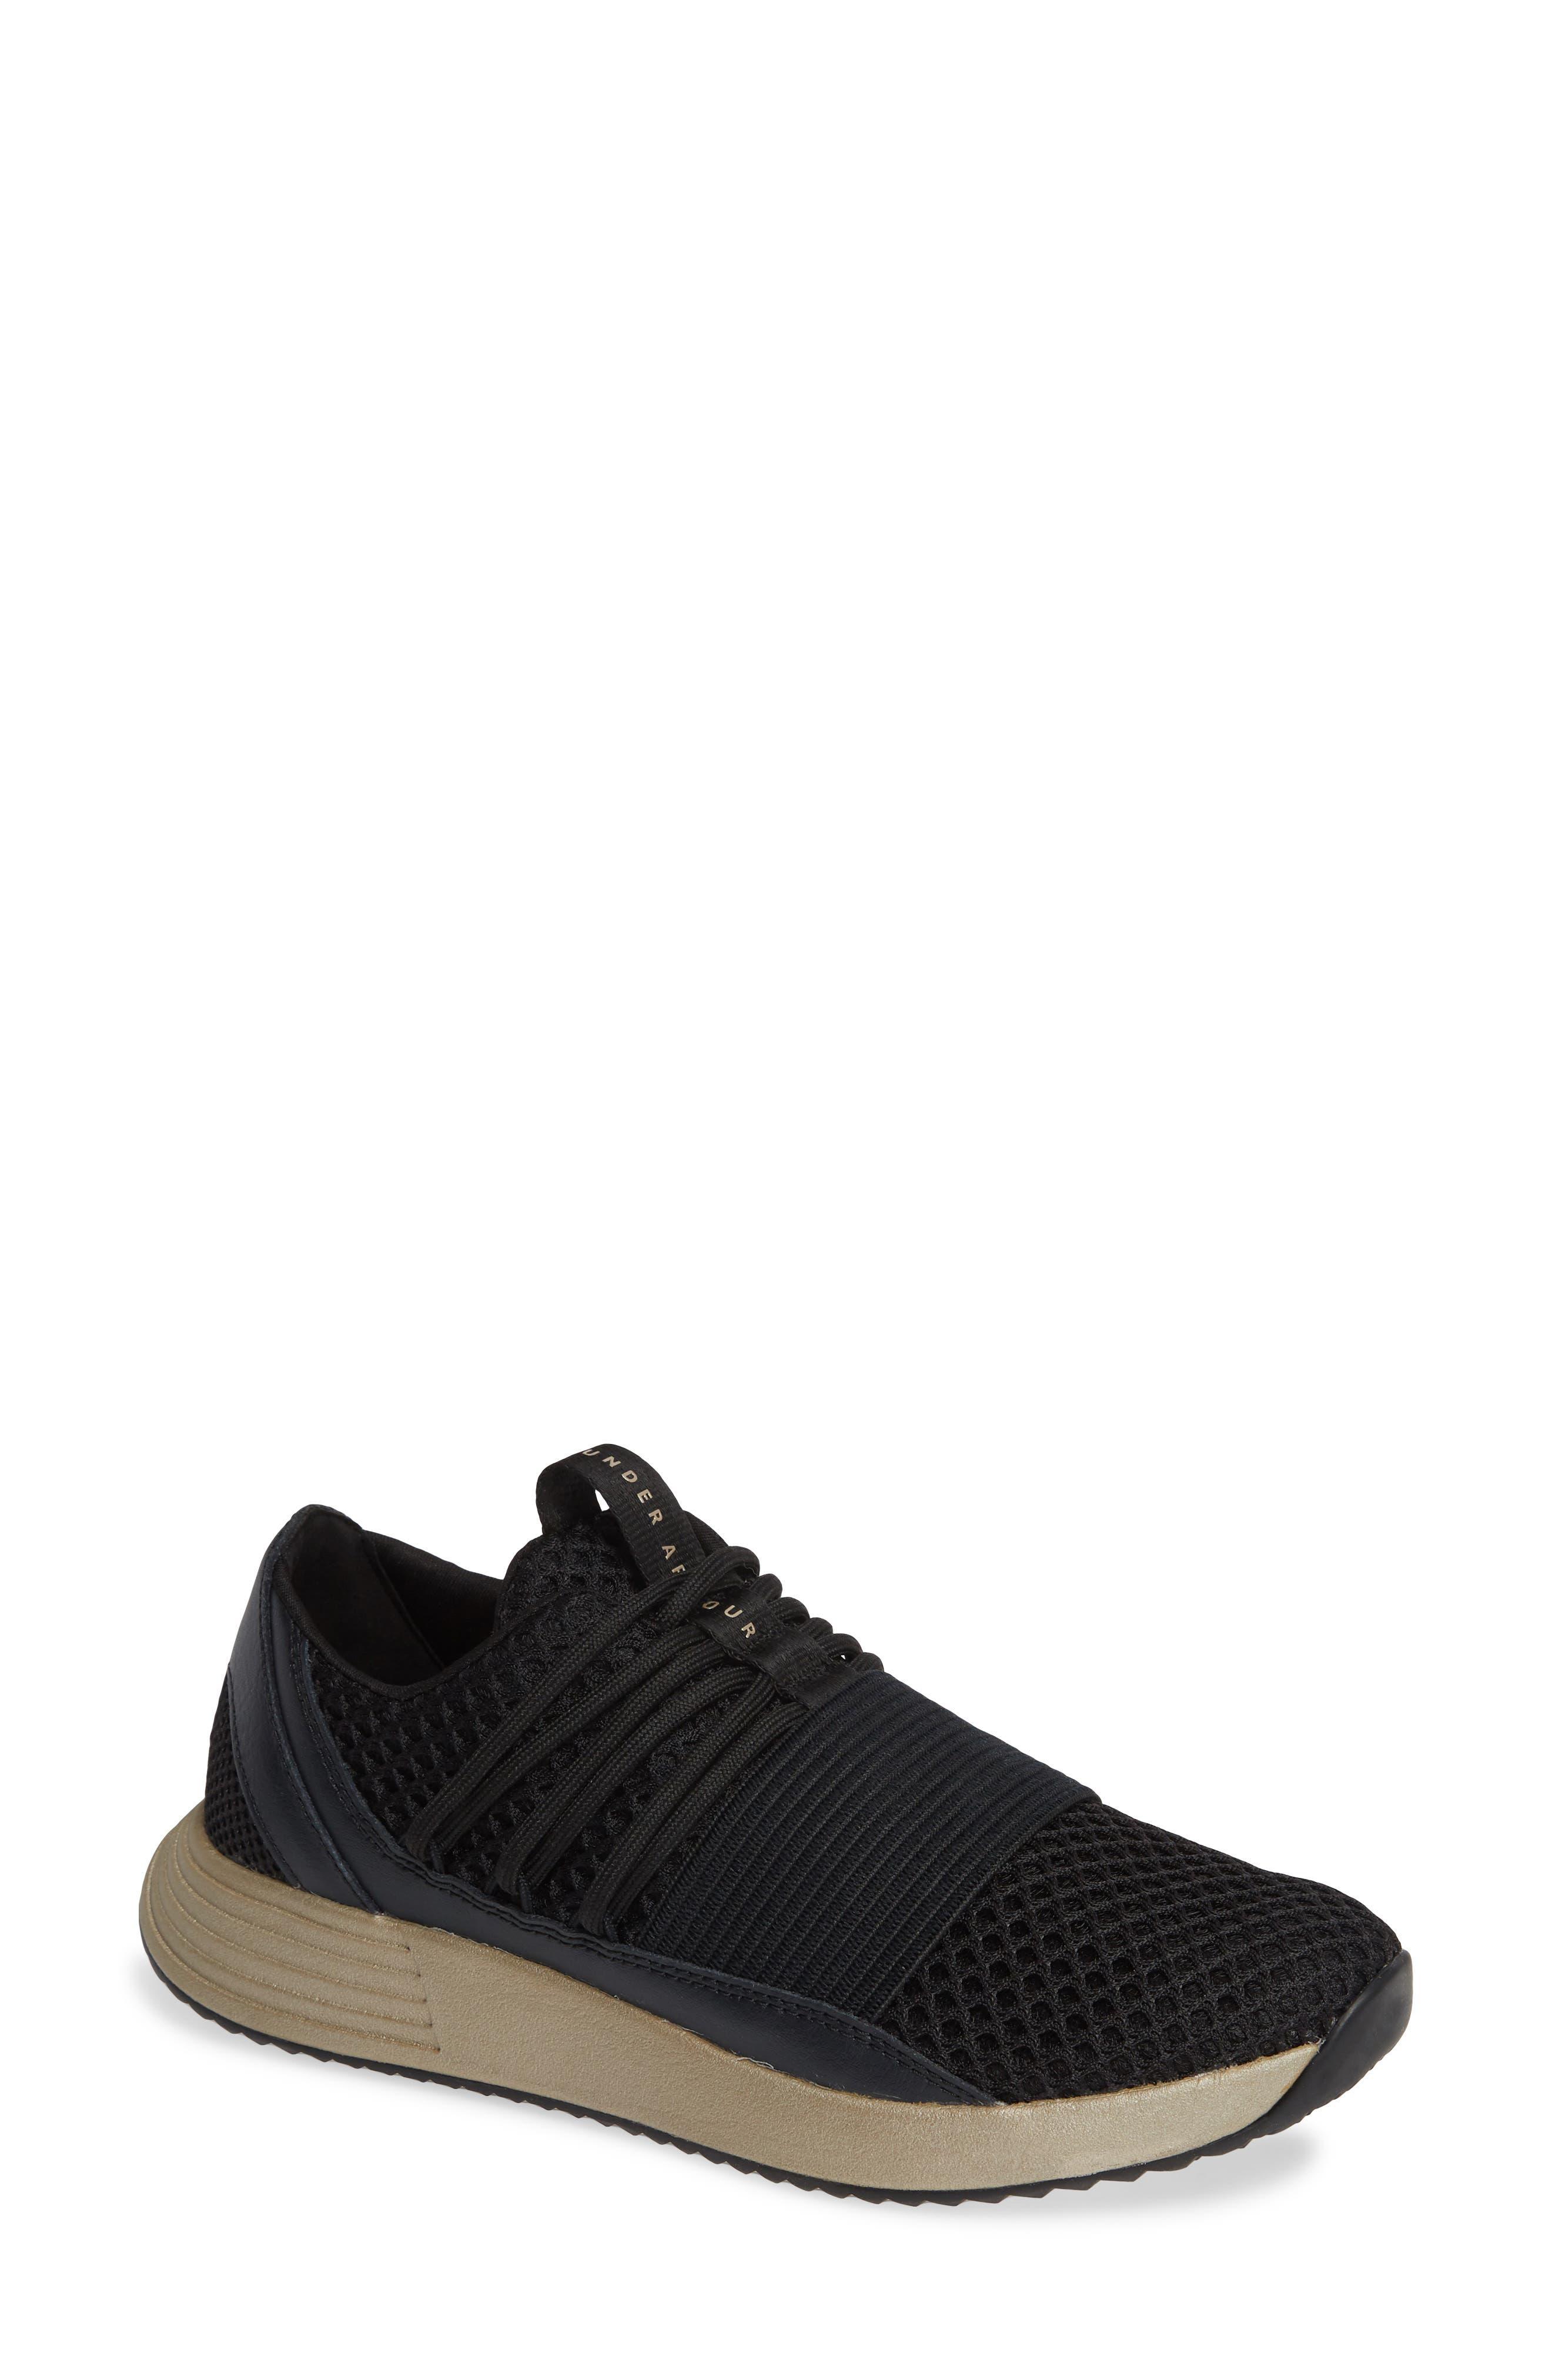 Breathe Lace X NM Sneaker,                         Main,                         color, BLACK/ METALLIC FADED GOLD